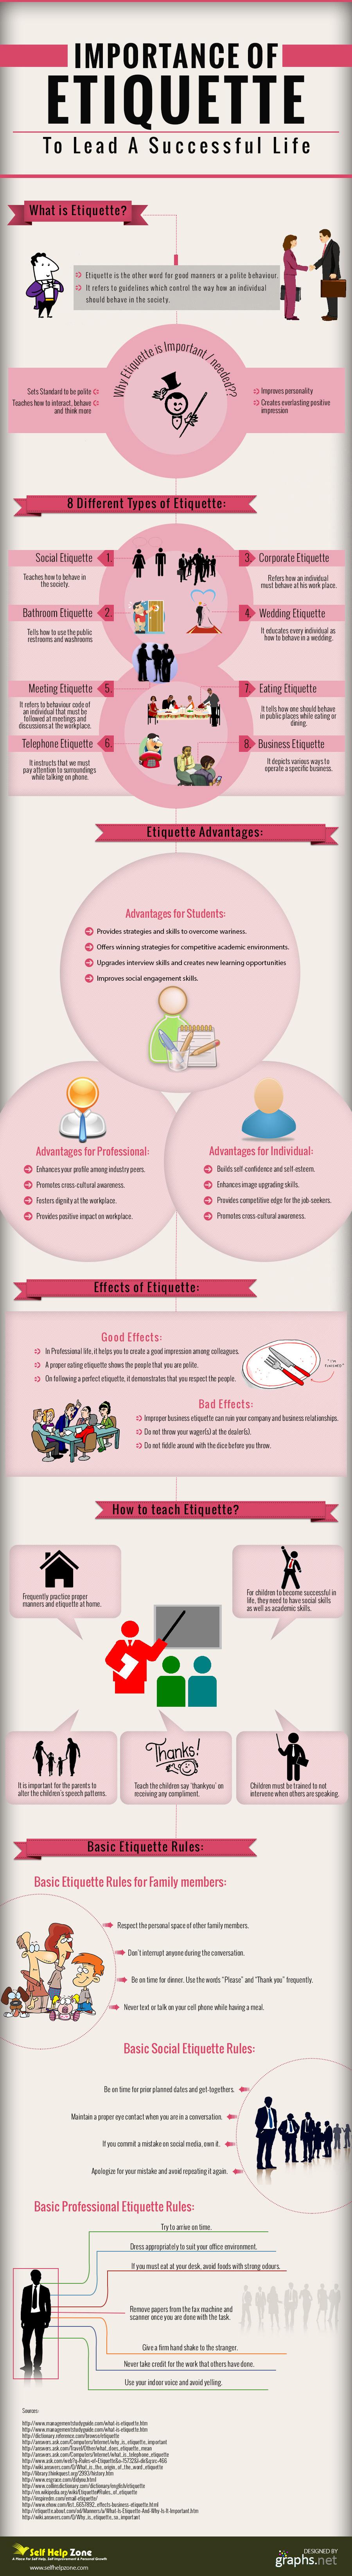 Etiquette Importance For Quality Life